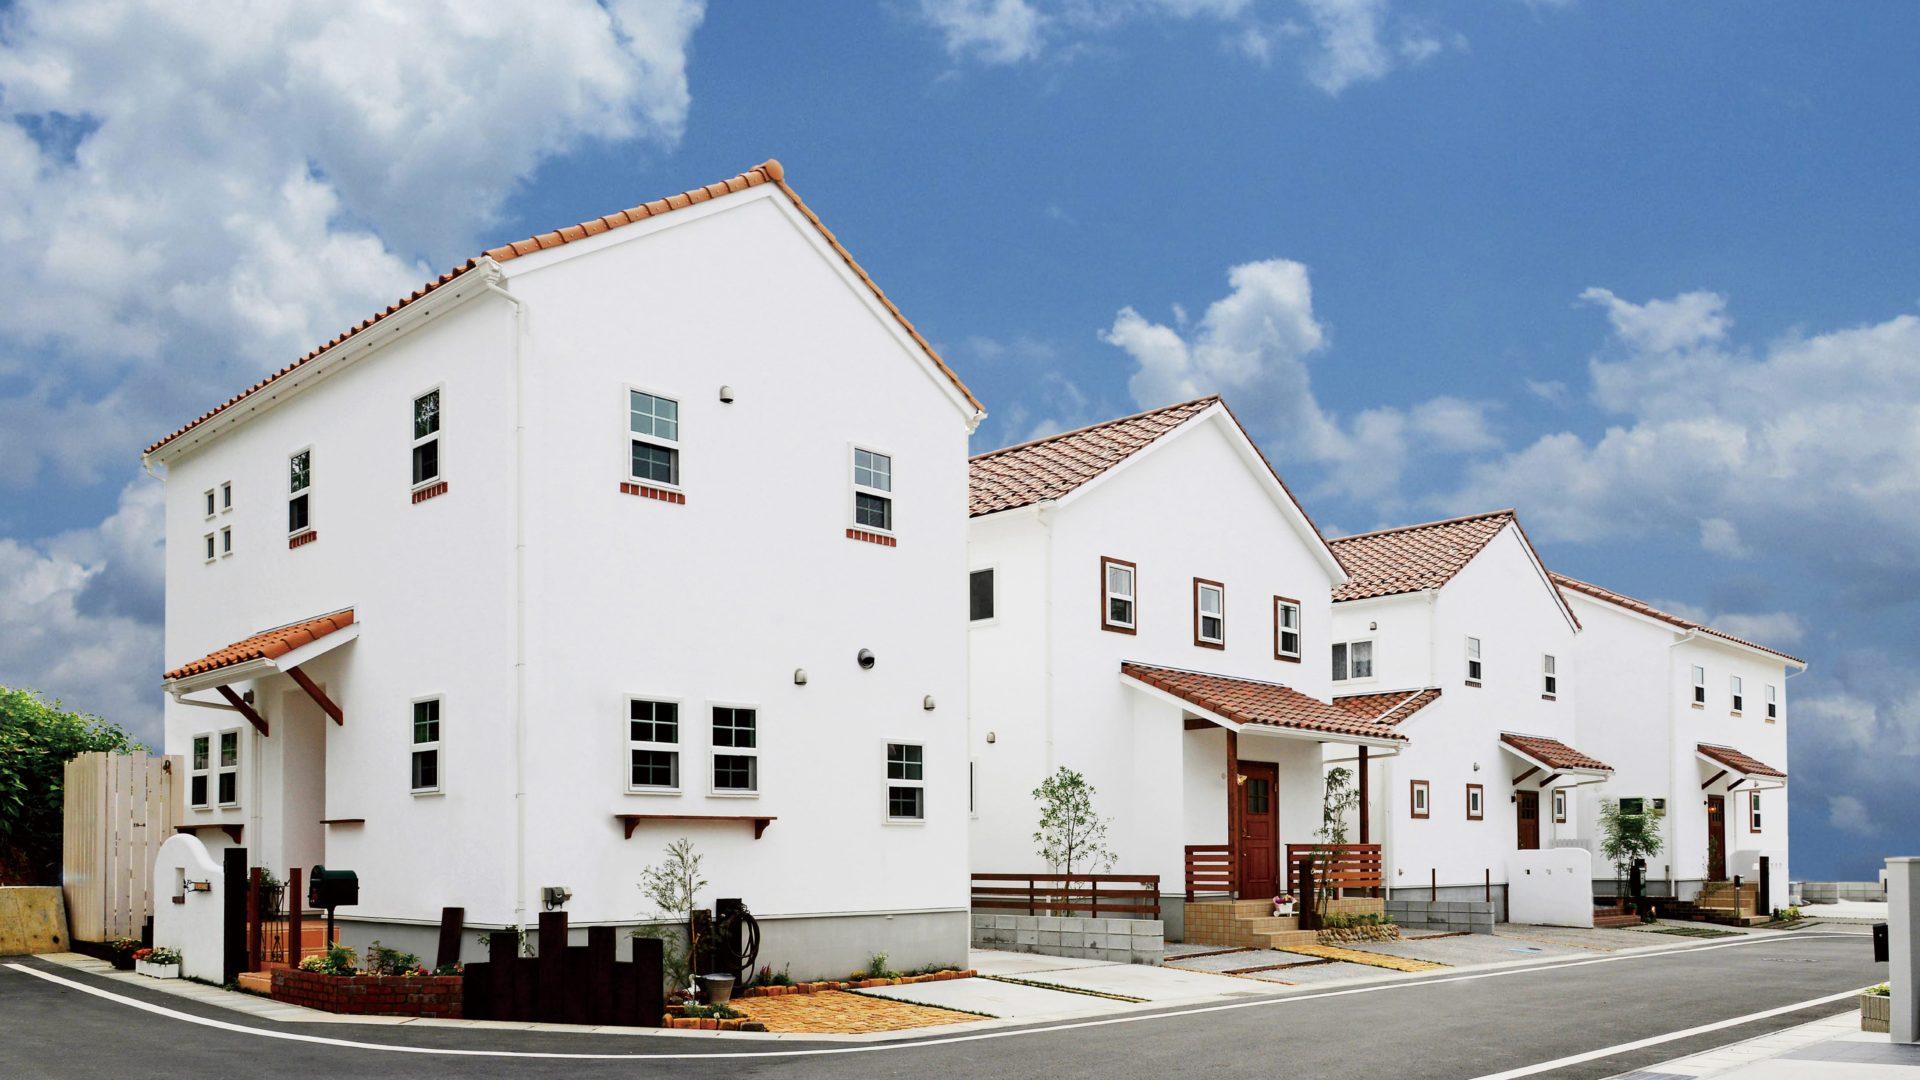 Woodhouse株式会社 |  福島県会津若松の新築やリフォーム